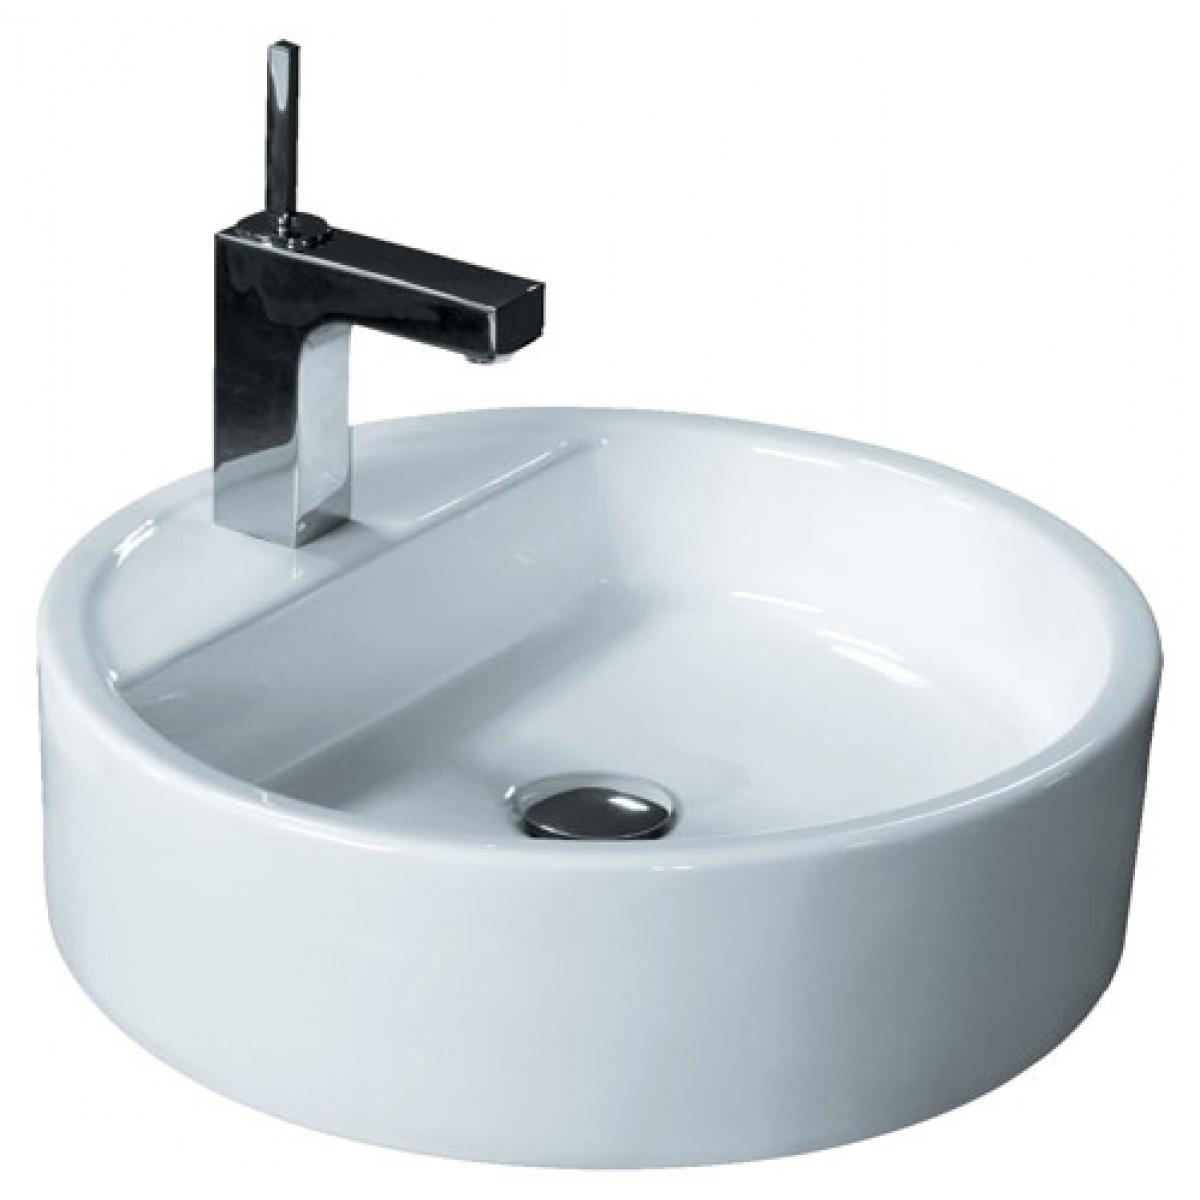 Sink Countertop Bathroom: Round Porcelain Ceramic Single Hole Countertop Bathroom